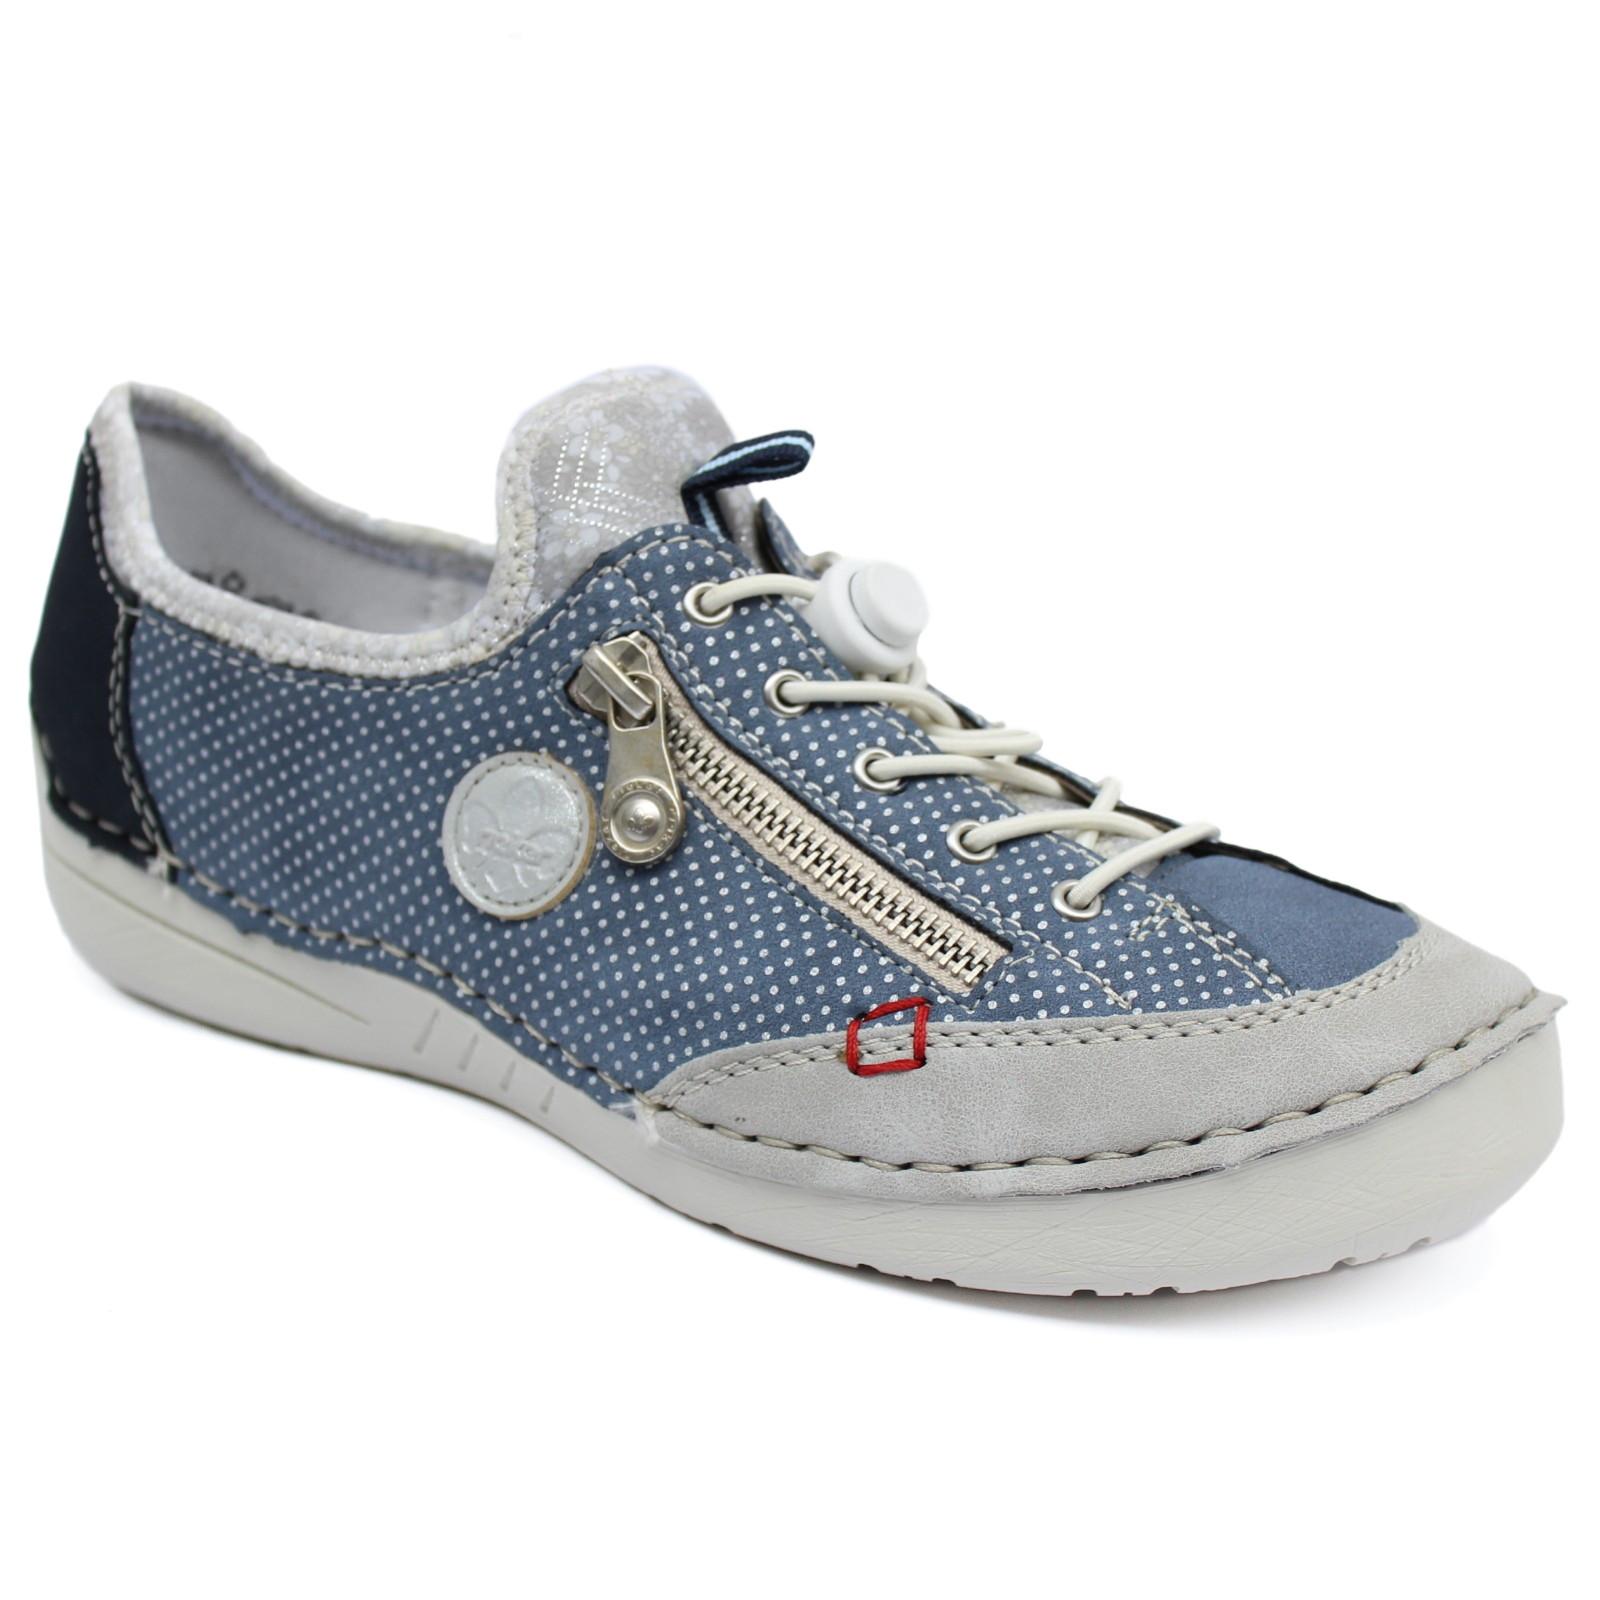 176886146 Kati női bebújós sneaker félcipő 2467 L002 Z003